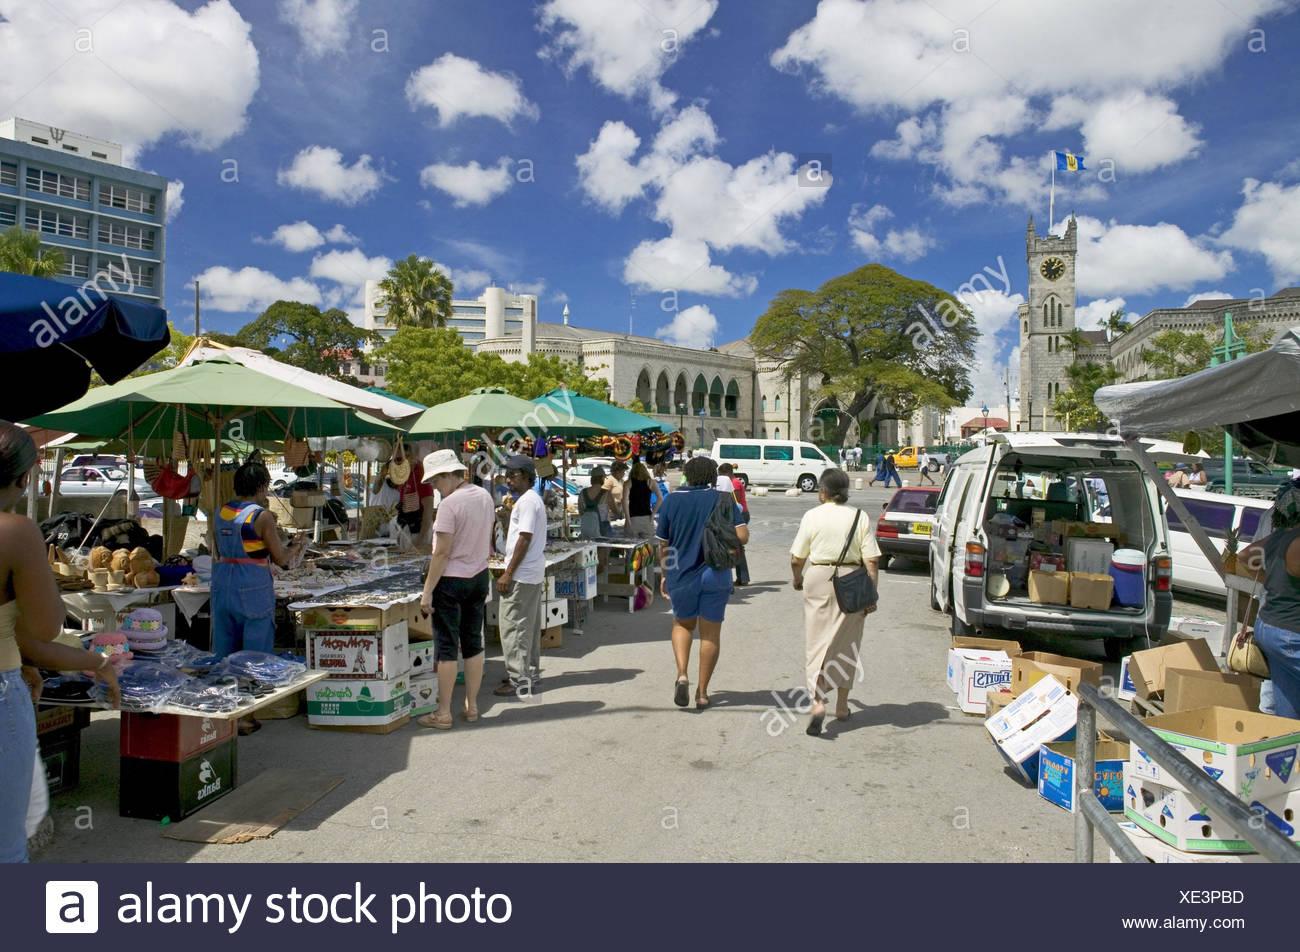 Barbados, Bridgetown, Straßenmarkt, Besucher, no model release - Stock Image